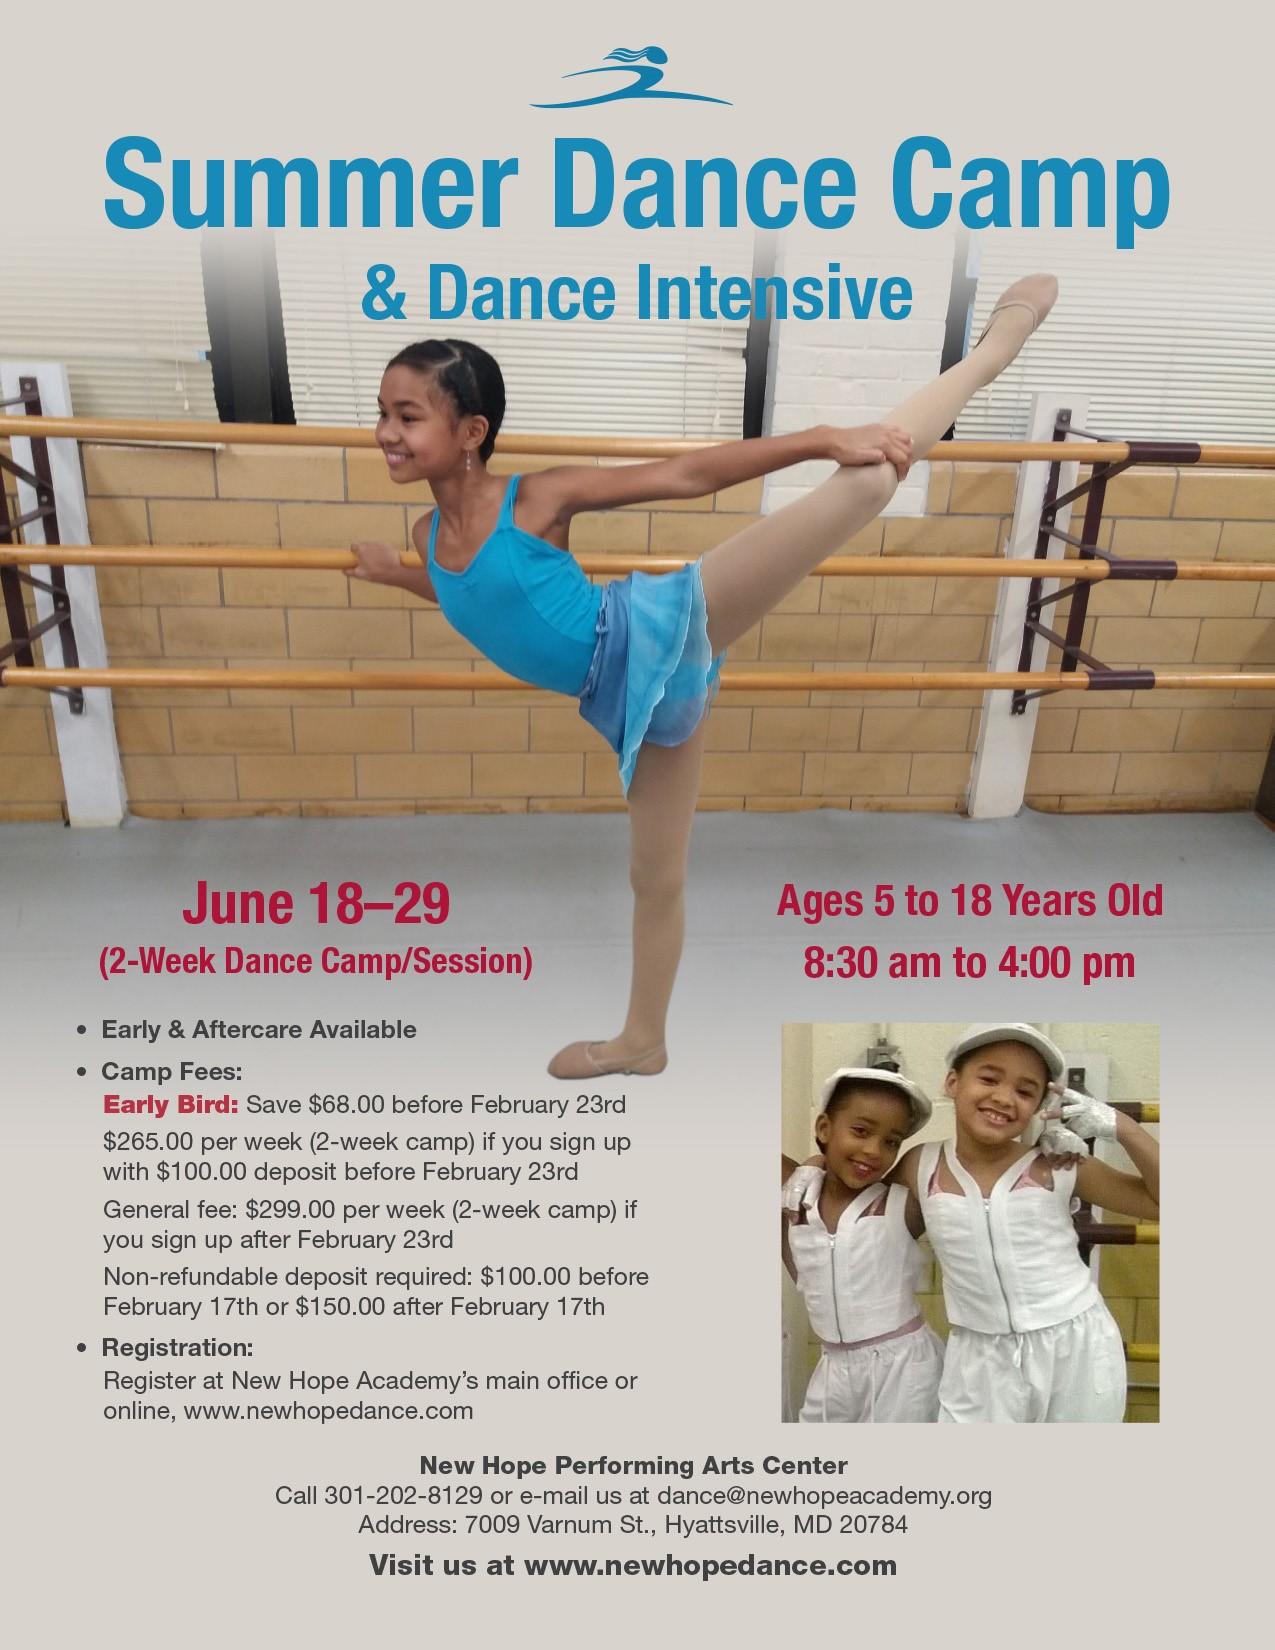 Summer Dance Camp and Dance Intensive, June 18 - 19 , 2018